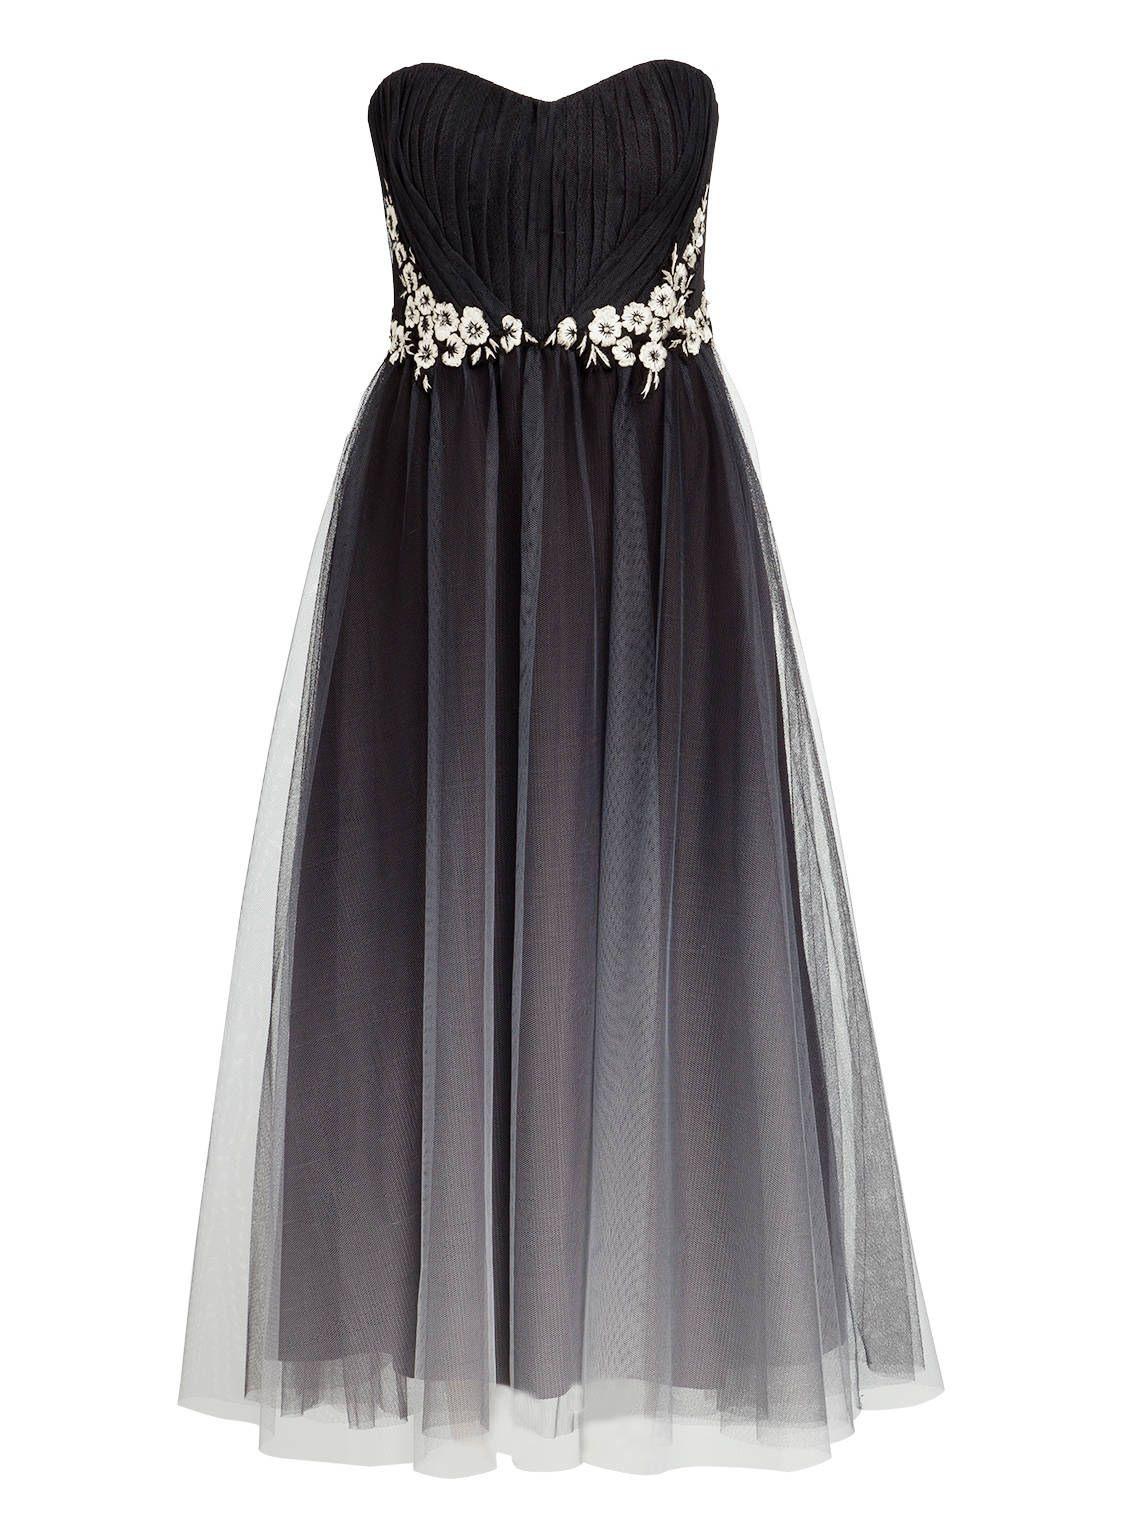 Designer Perfekt Breuninger Abendkleid Design20 Großartig Breuninger Abendkleid Stylish